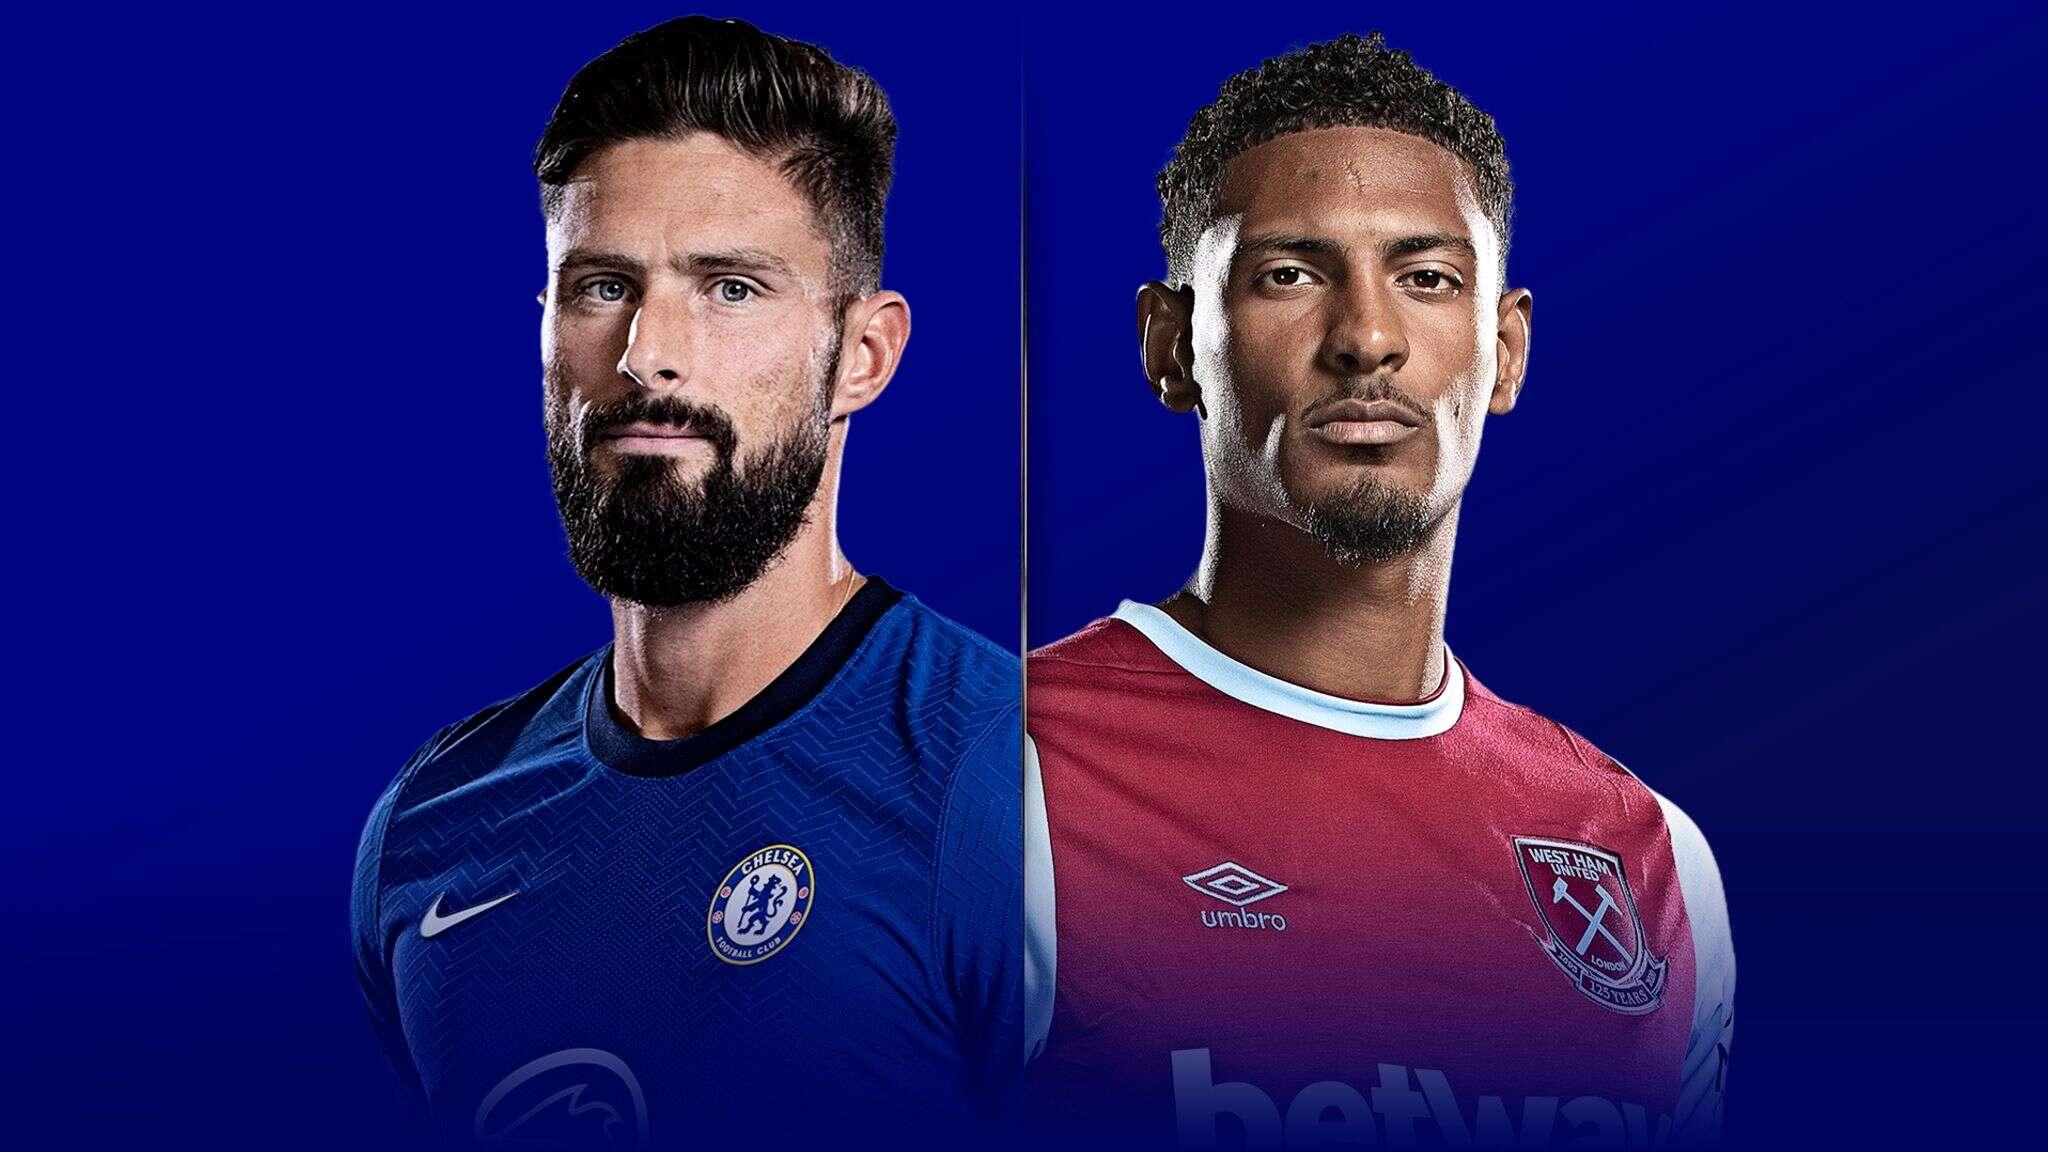 London Derby: Premier League Actions return tonight as Chelsea take on West Ham